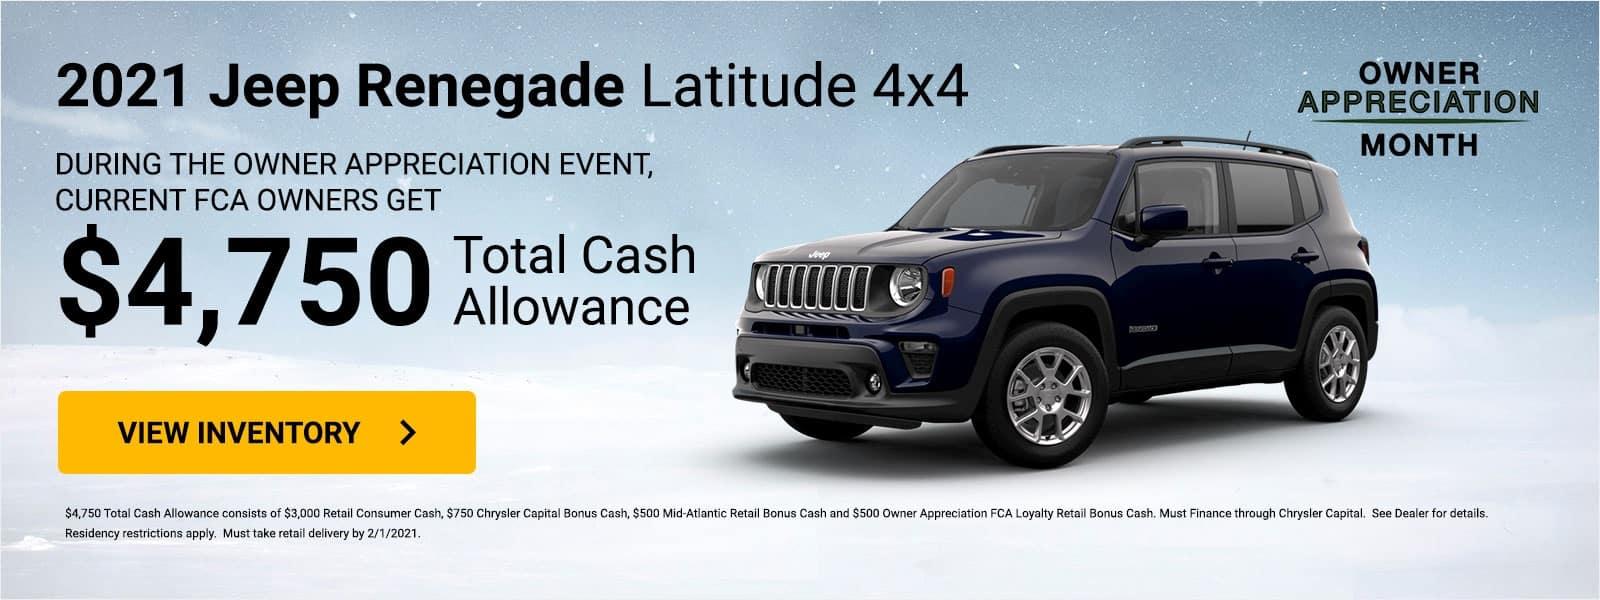 jeep-renegade-latitude-4×4 RETAIL (All Markets) (1)